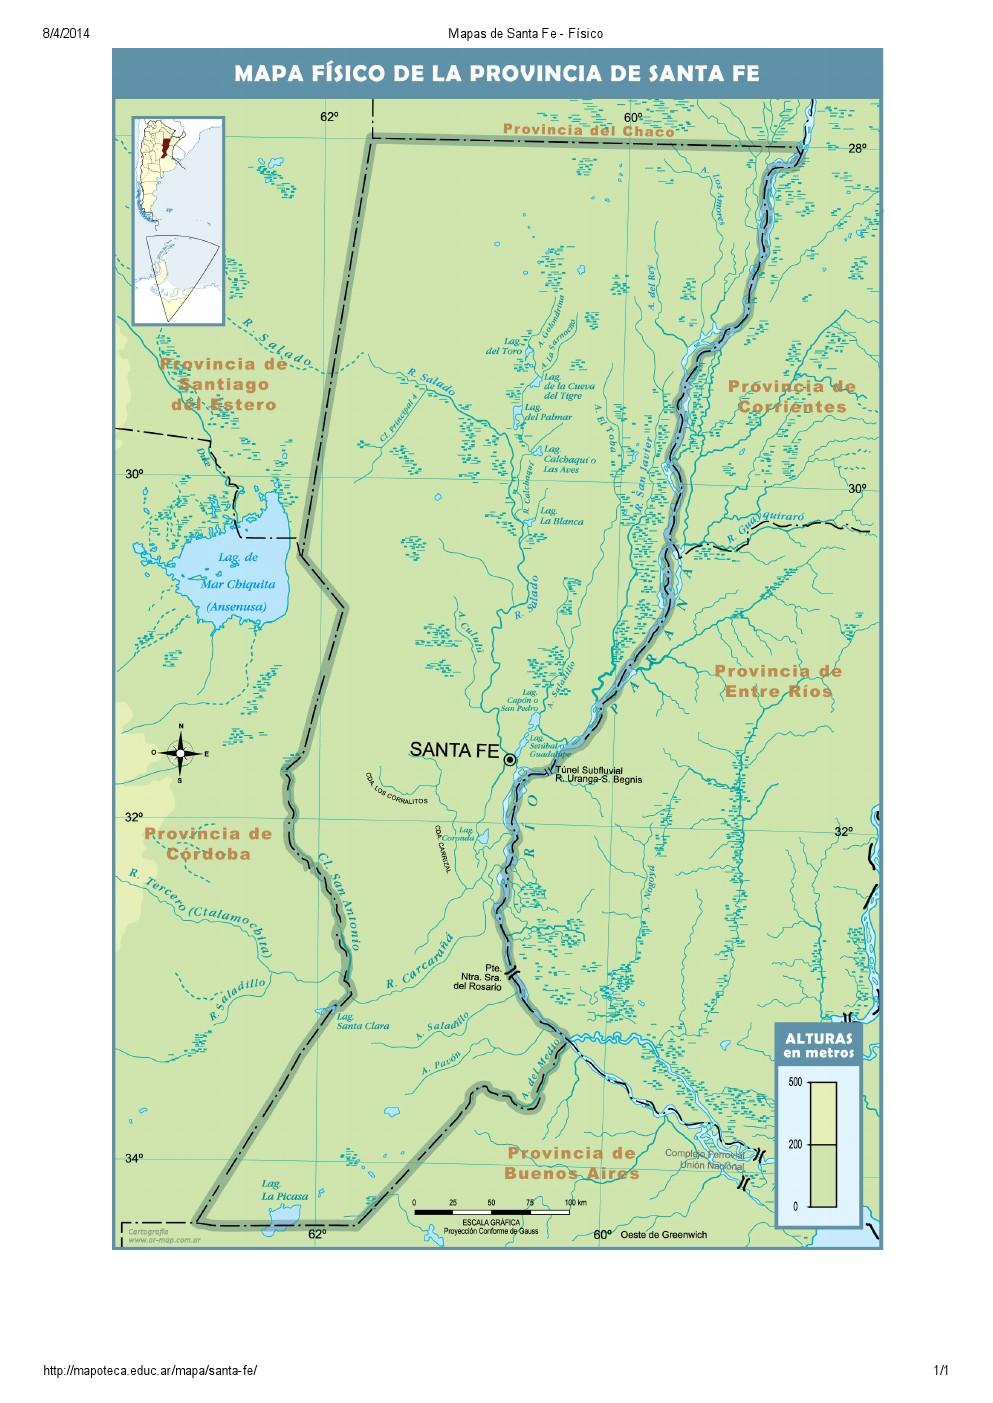 Mapa de ríos de Santa Fe. Mapoteca de Educ.ar